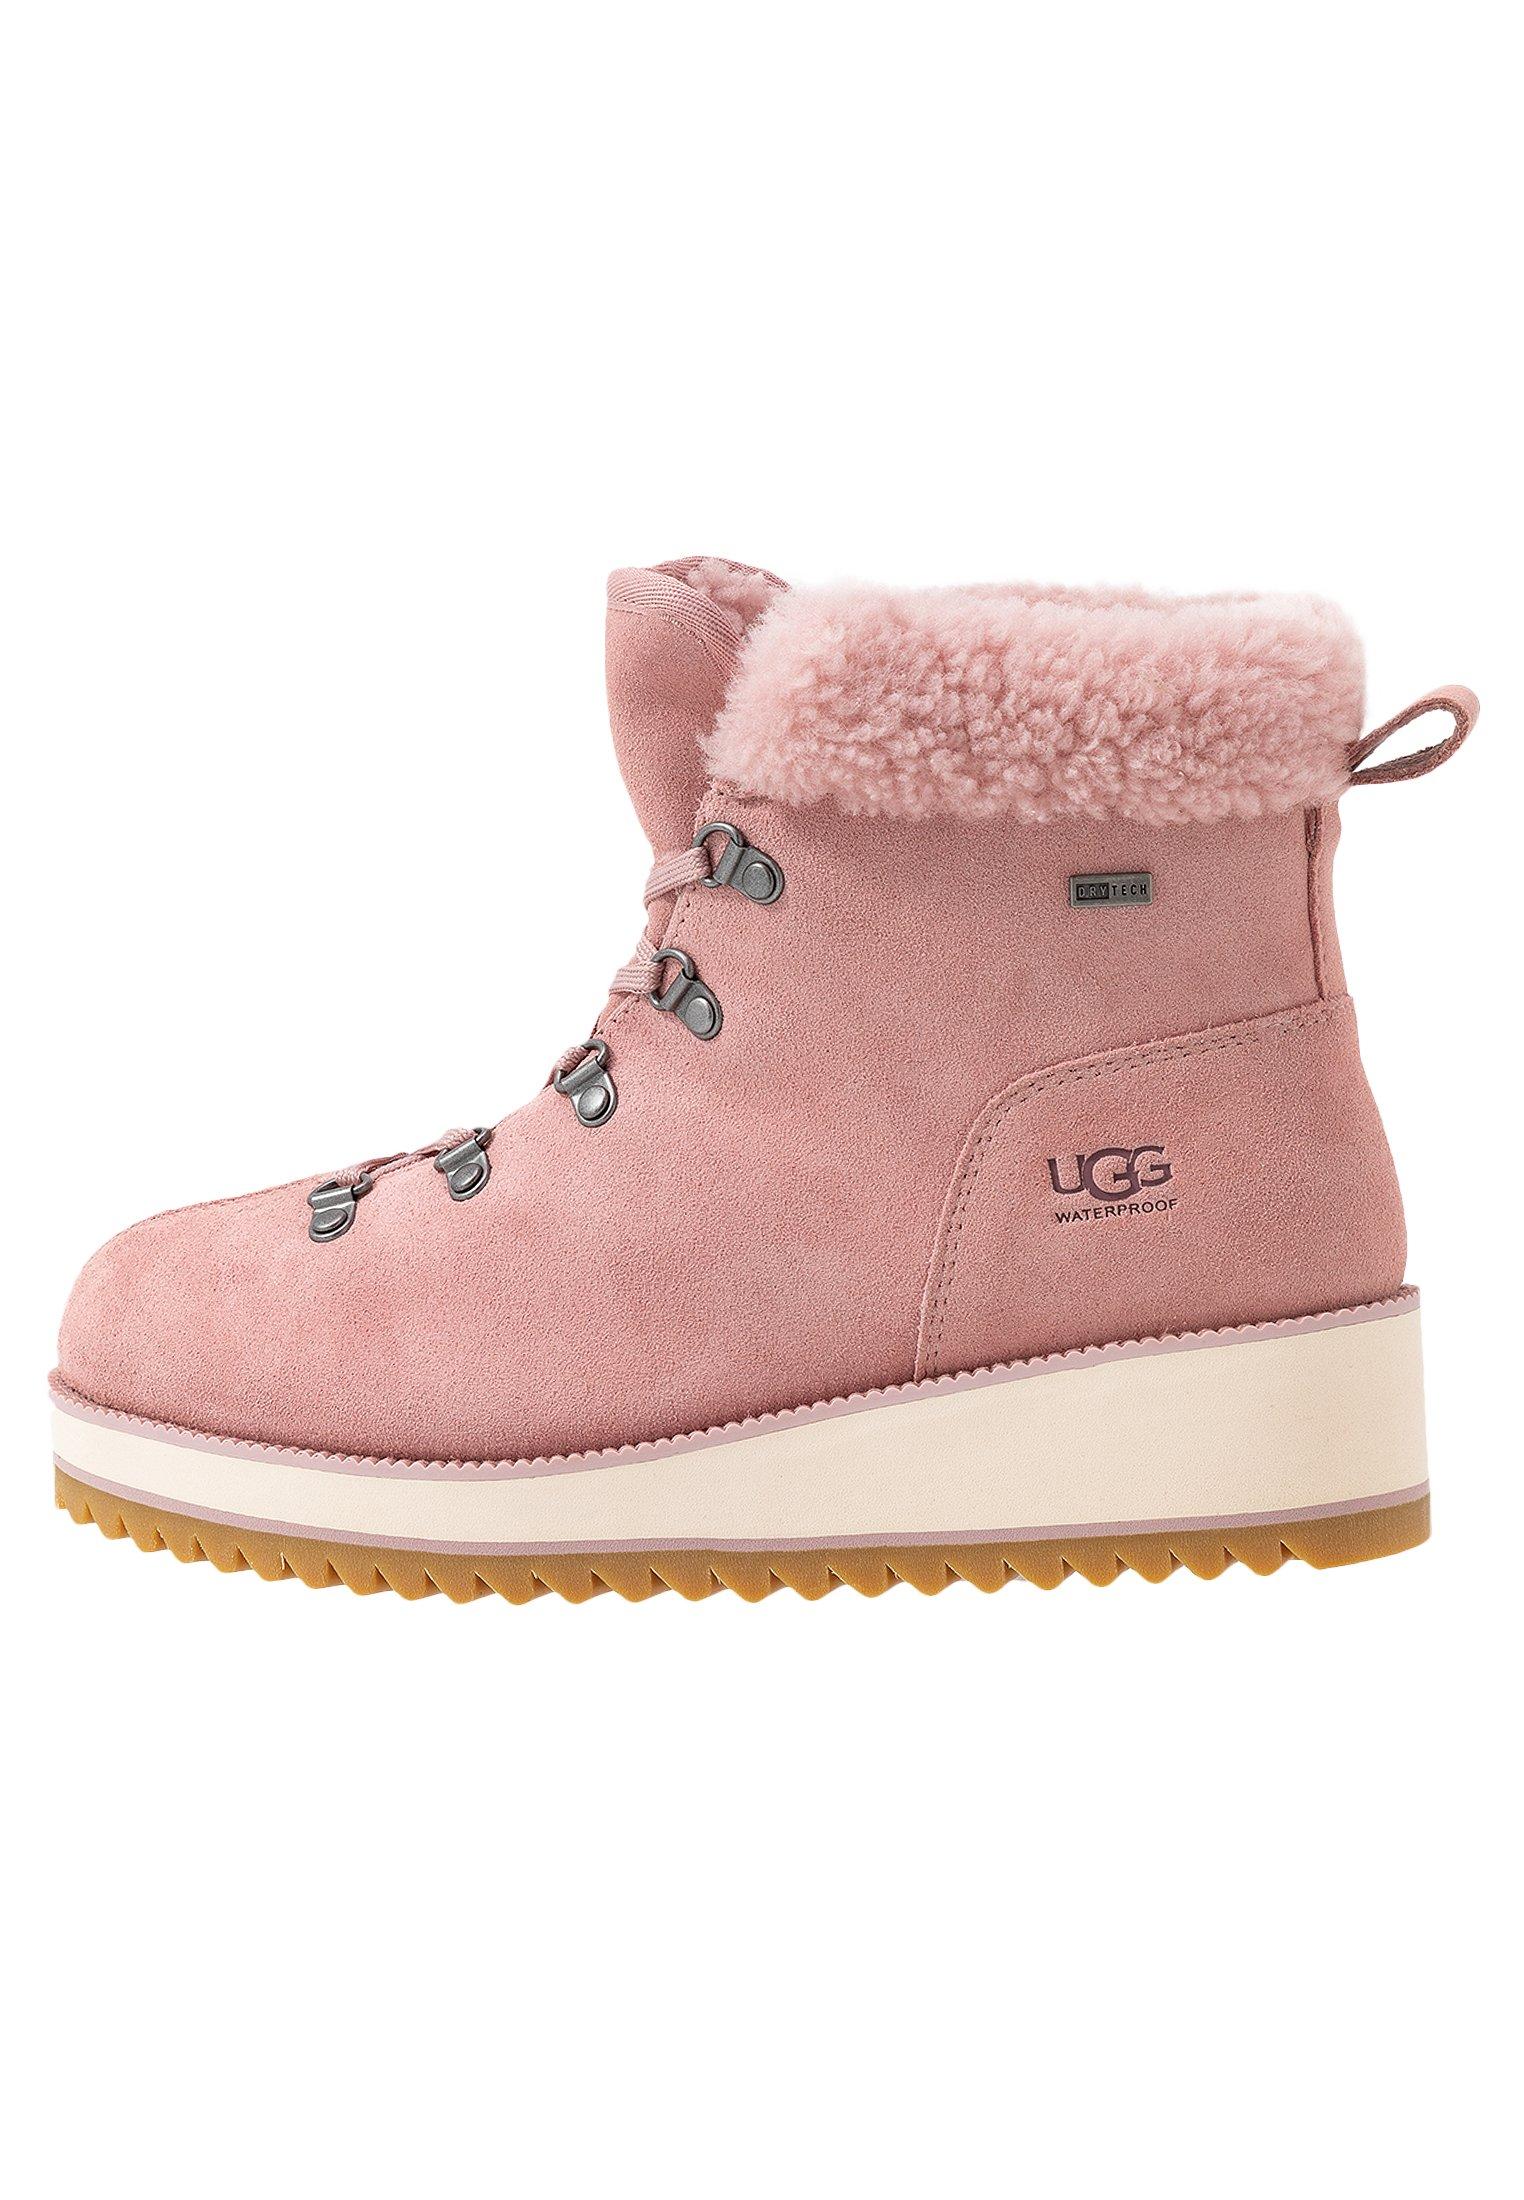 UGG BIRCH LACE-UP - Śniegowce - pink